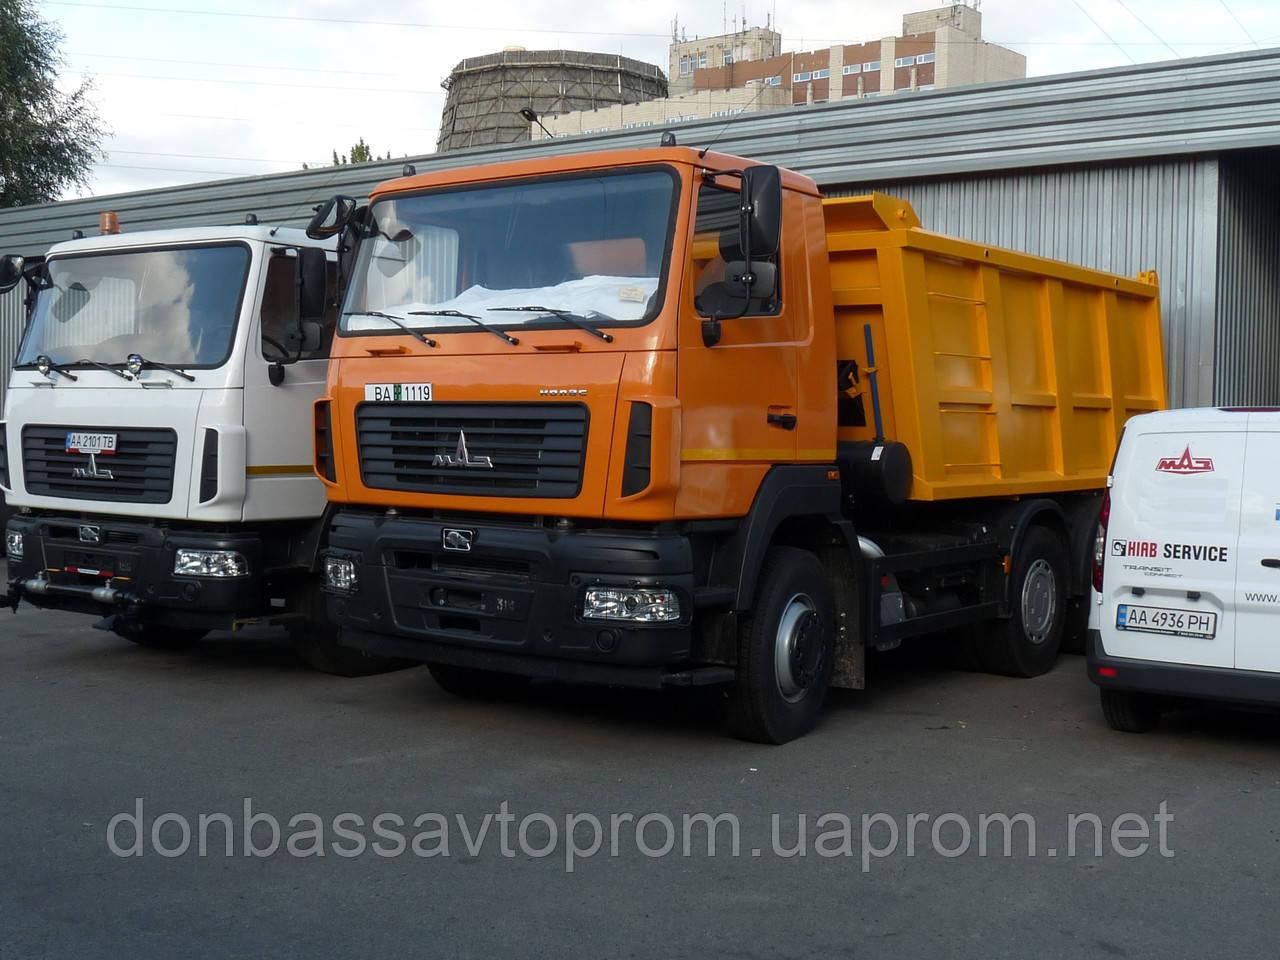 Новый самосвал МАЗ-6501С5-584-000 г.п. 20 тонн